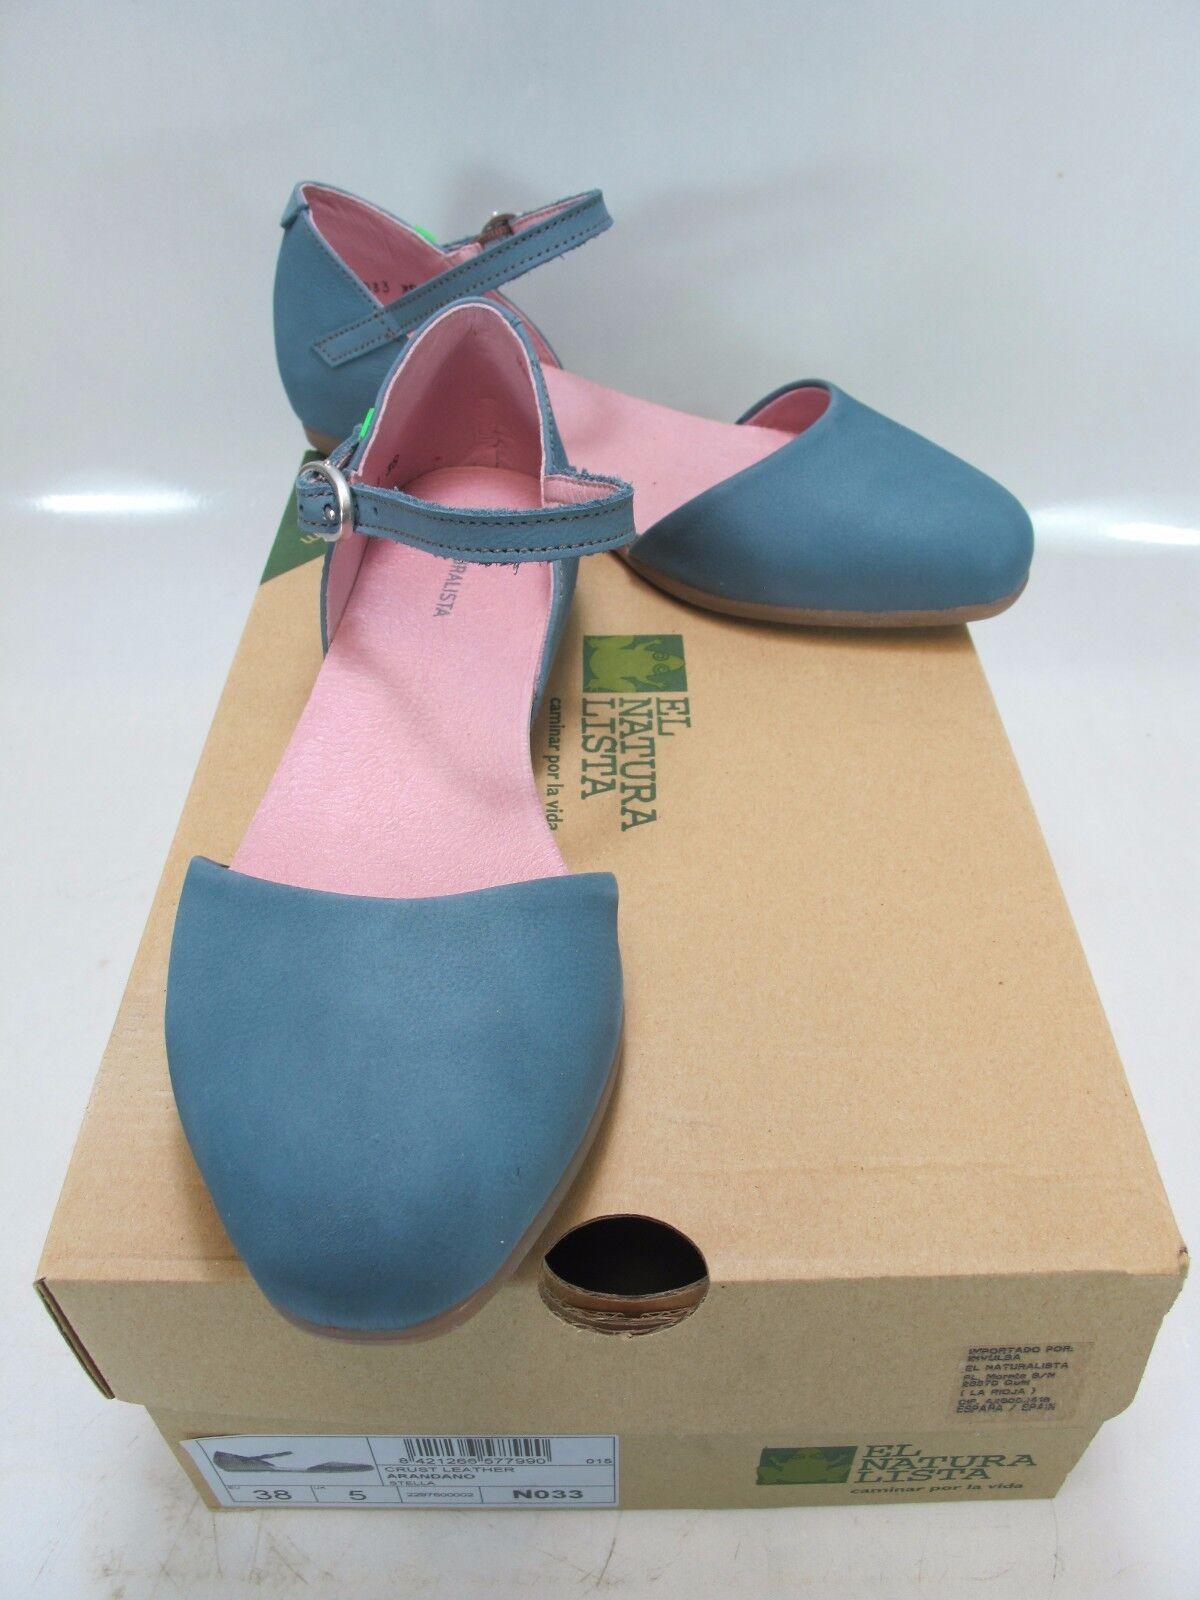 EL NATURALISTA Damenschuhe STELLA Piece N033 Blau Leder Two Piece STELLA Ballet Flat US 7 514201